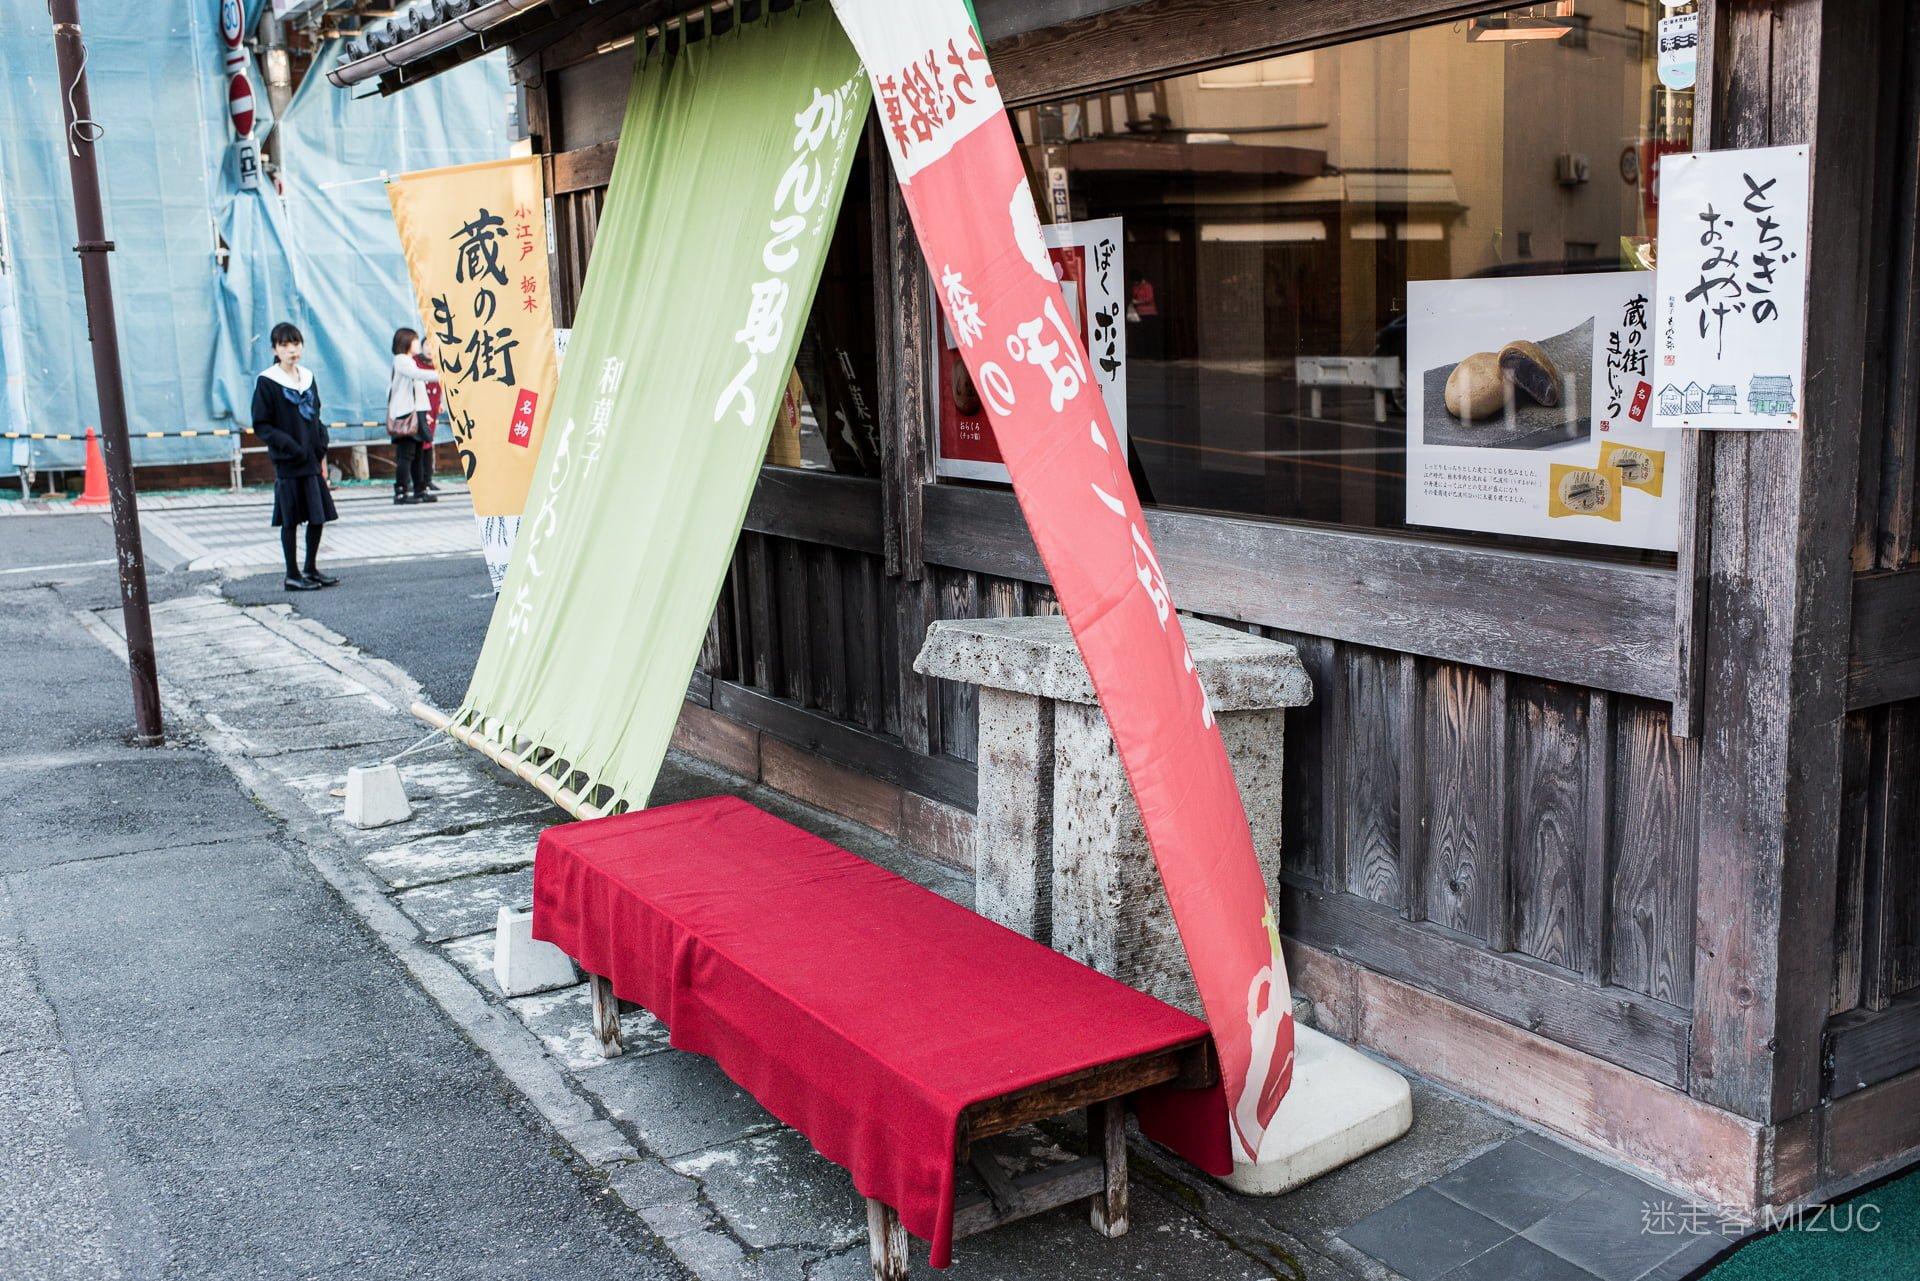 201711 Ibaraki Tochigi Gunma Japan Travel By RentalCar 64 日本自駕旅遊/北關東三縣「茨城、櫪木、群馬」秋天美食、溫泉與瀑布秘境百景(精選照片分享)